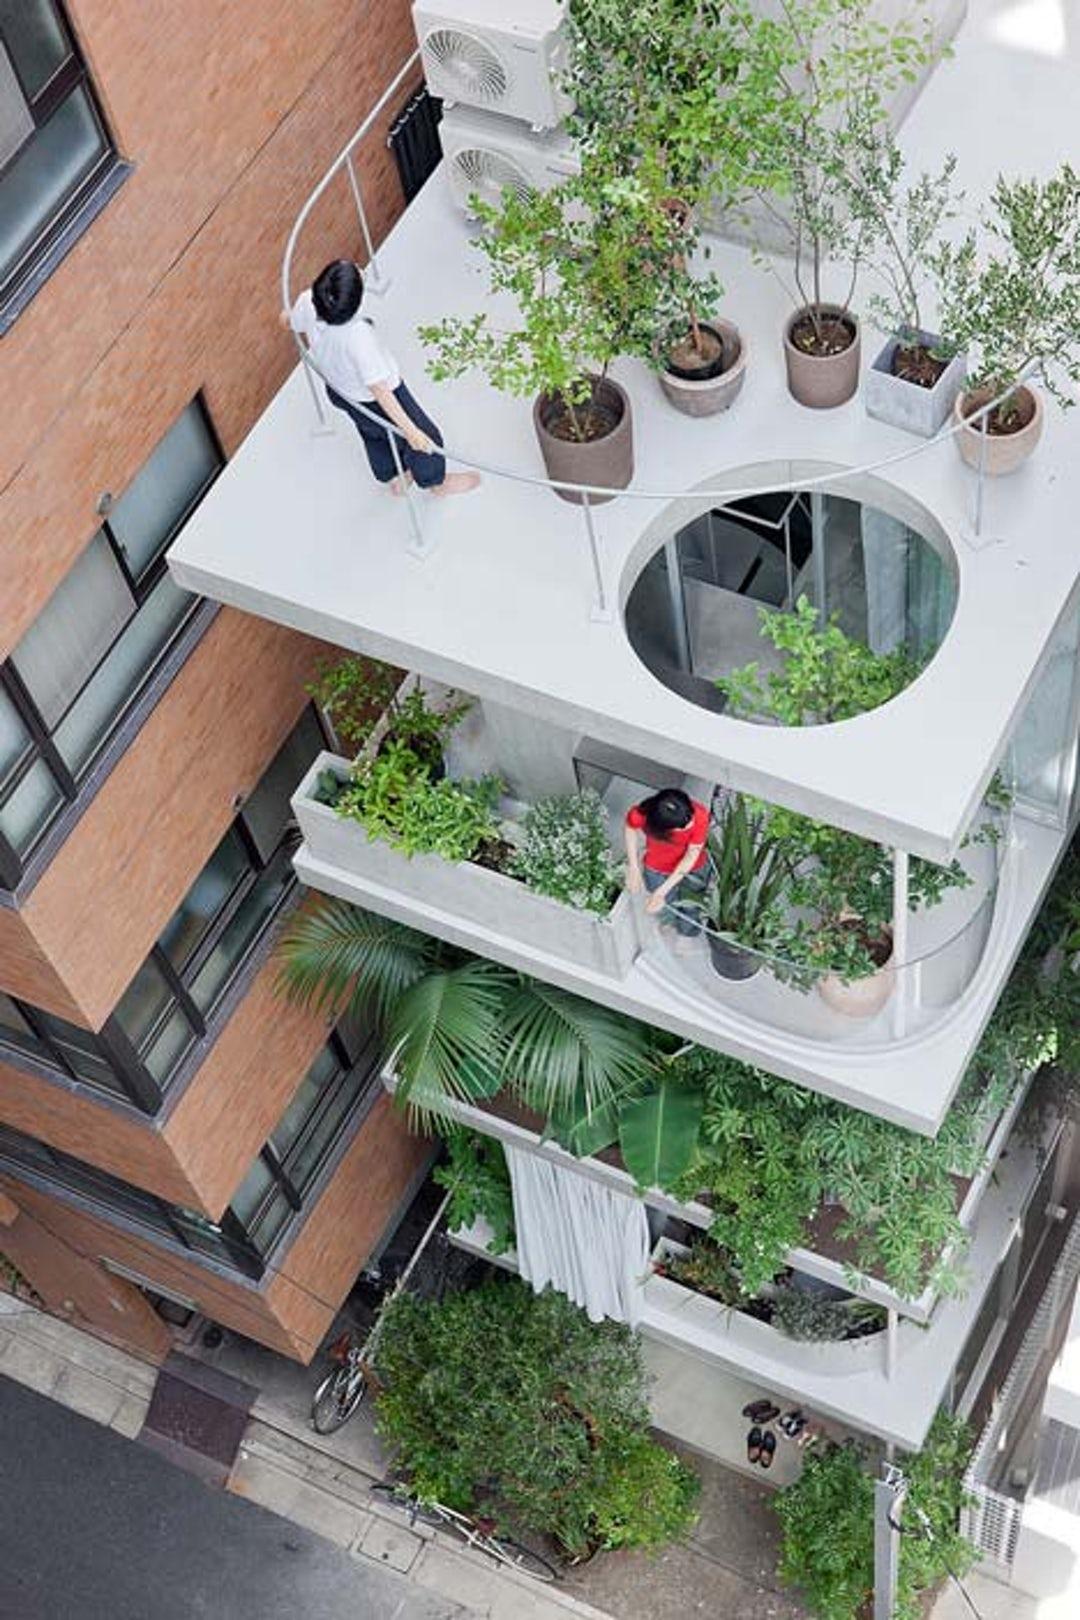 House and Garden by Ryue Nishizawa, Tokyo, Japan